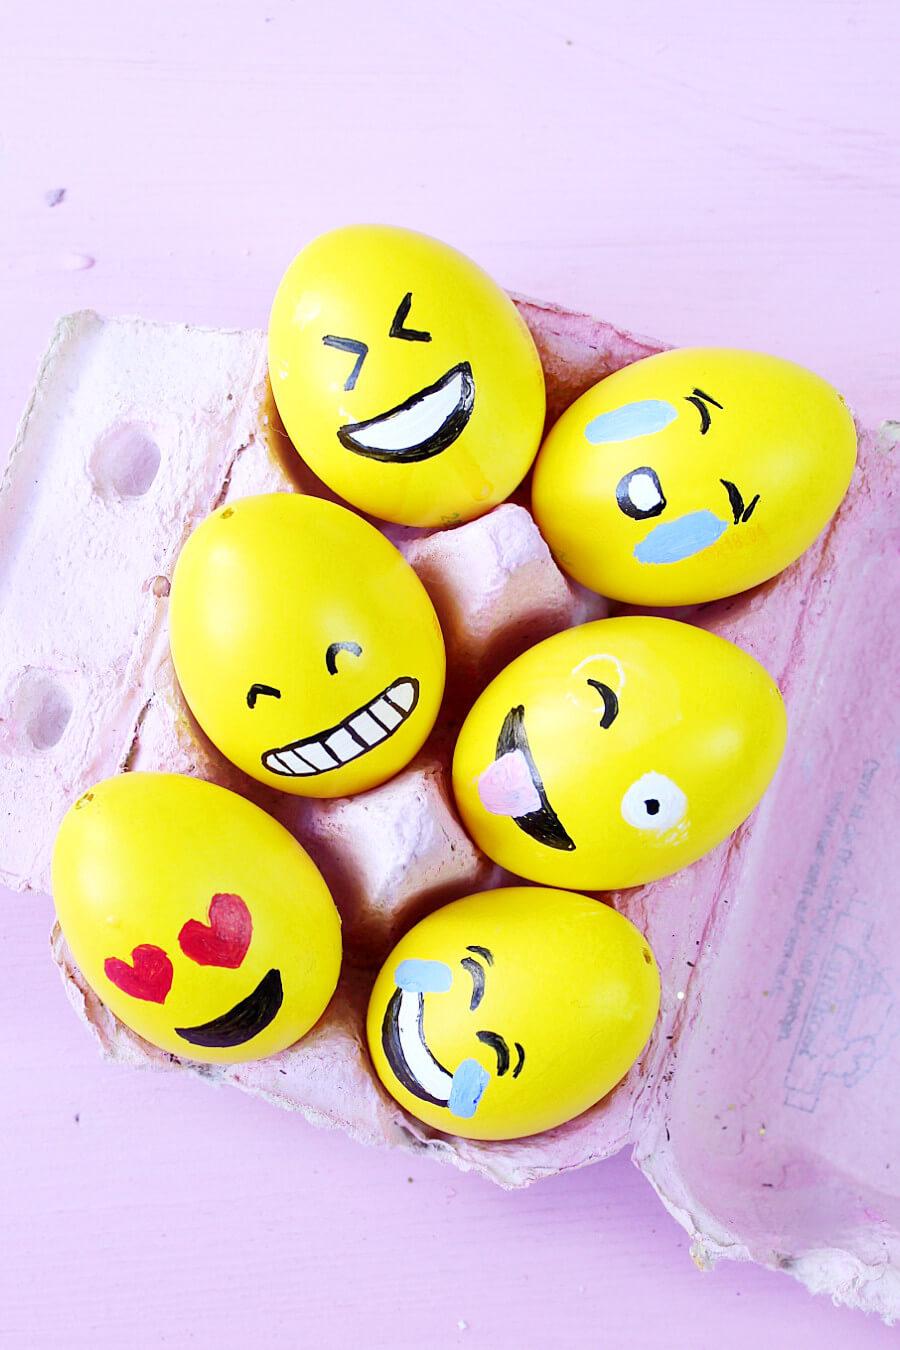 Diy Emoji Ostereier Selber Machen 3 Kreative Oster Deko Ideen